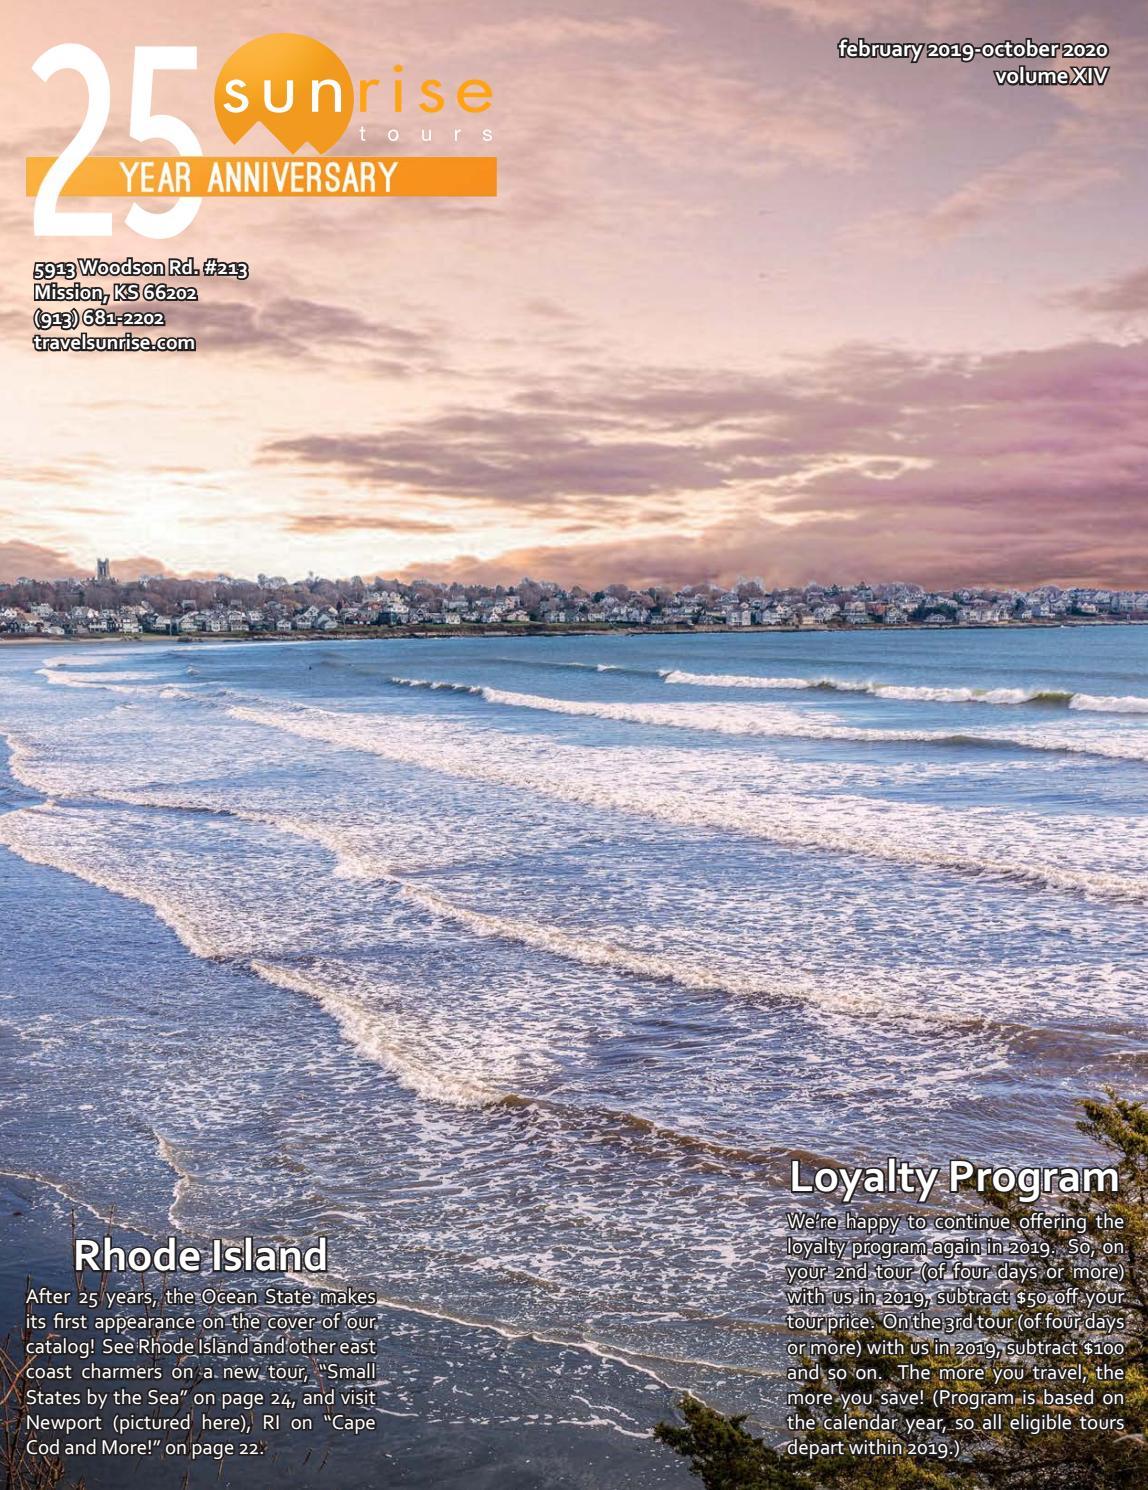 2021 Sunrise Sunset Tableszip Code | Printable with Sunrise Sunset Times Zip Code